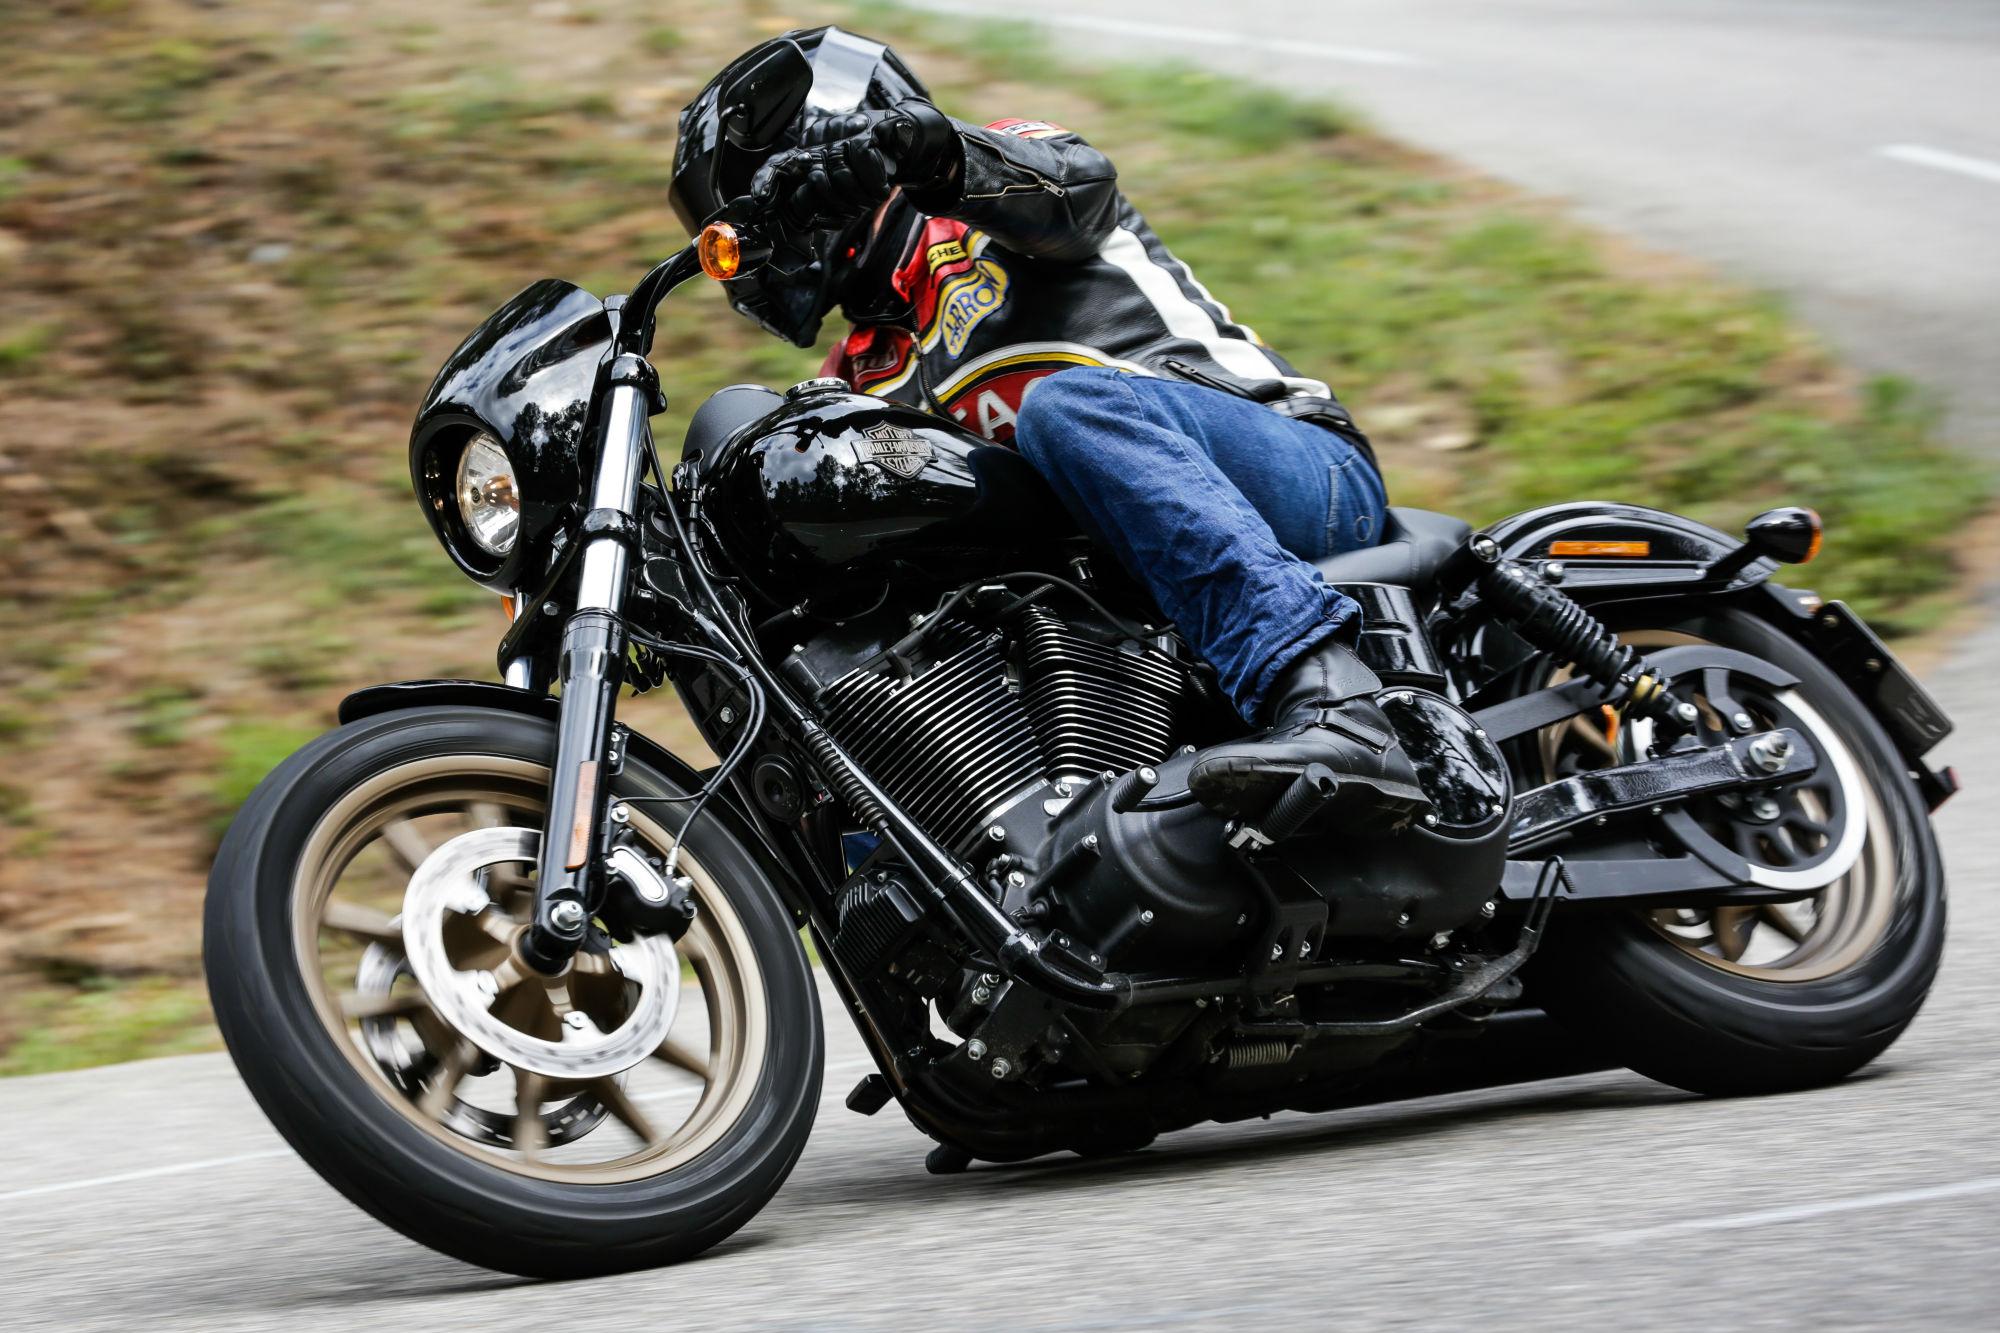 Harley Davidson: First Ride: Harley-Davidson Roadster And...